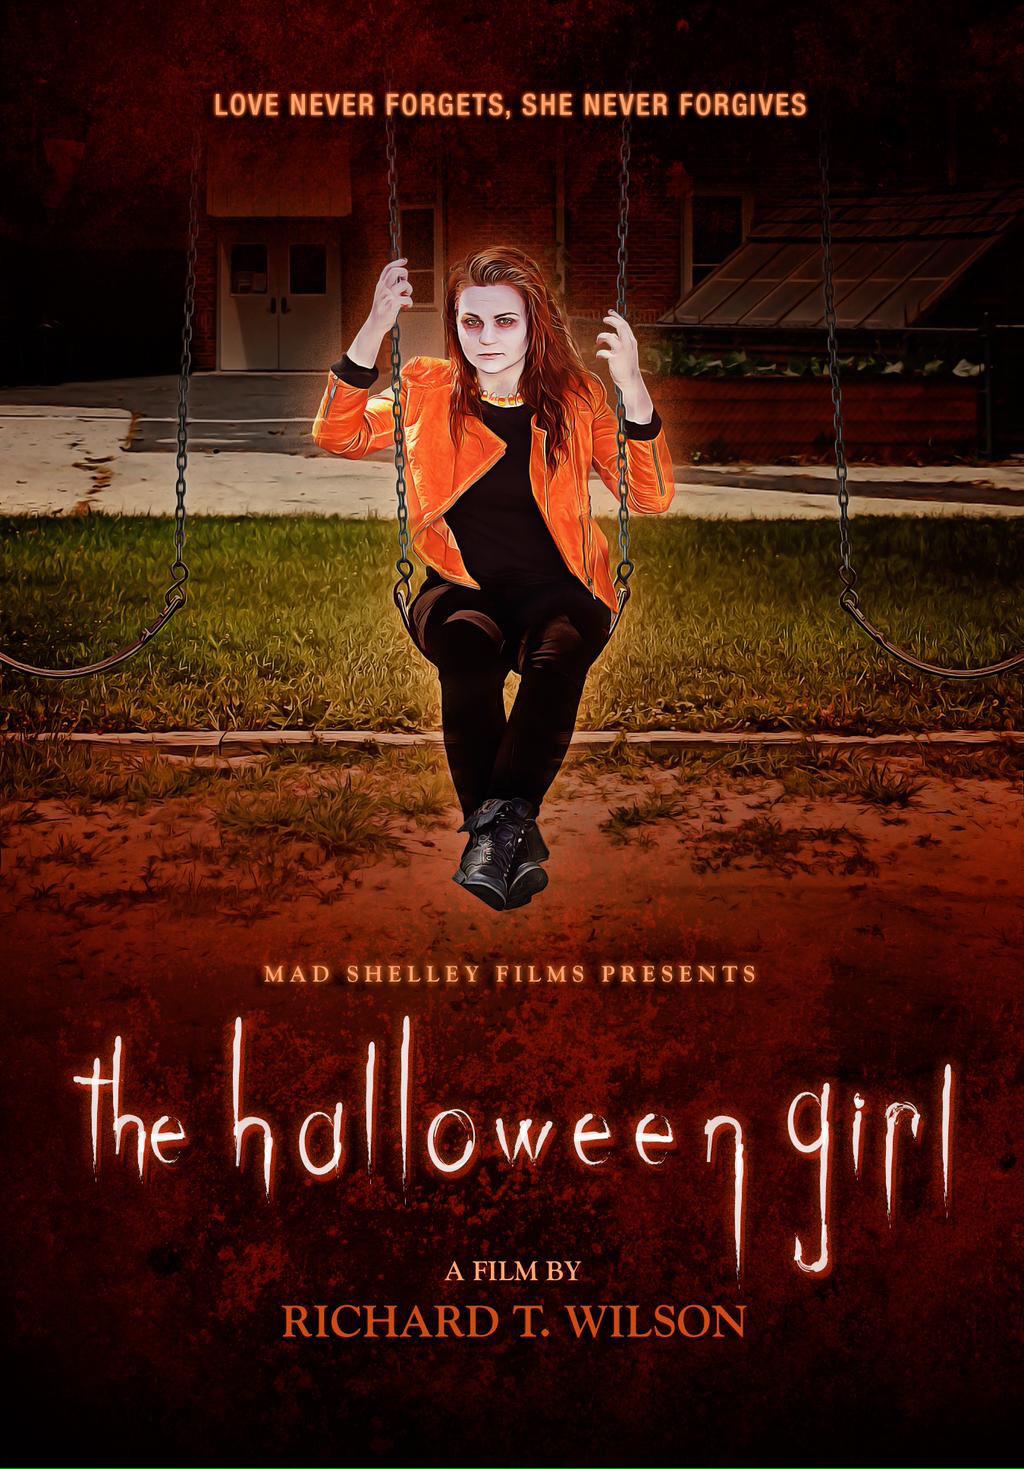 Picture Short film, Halloween girl, Shelley film